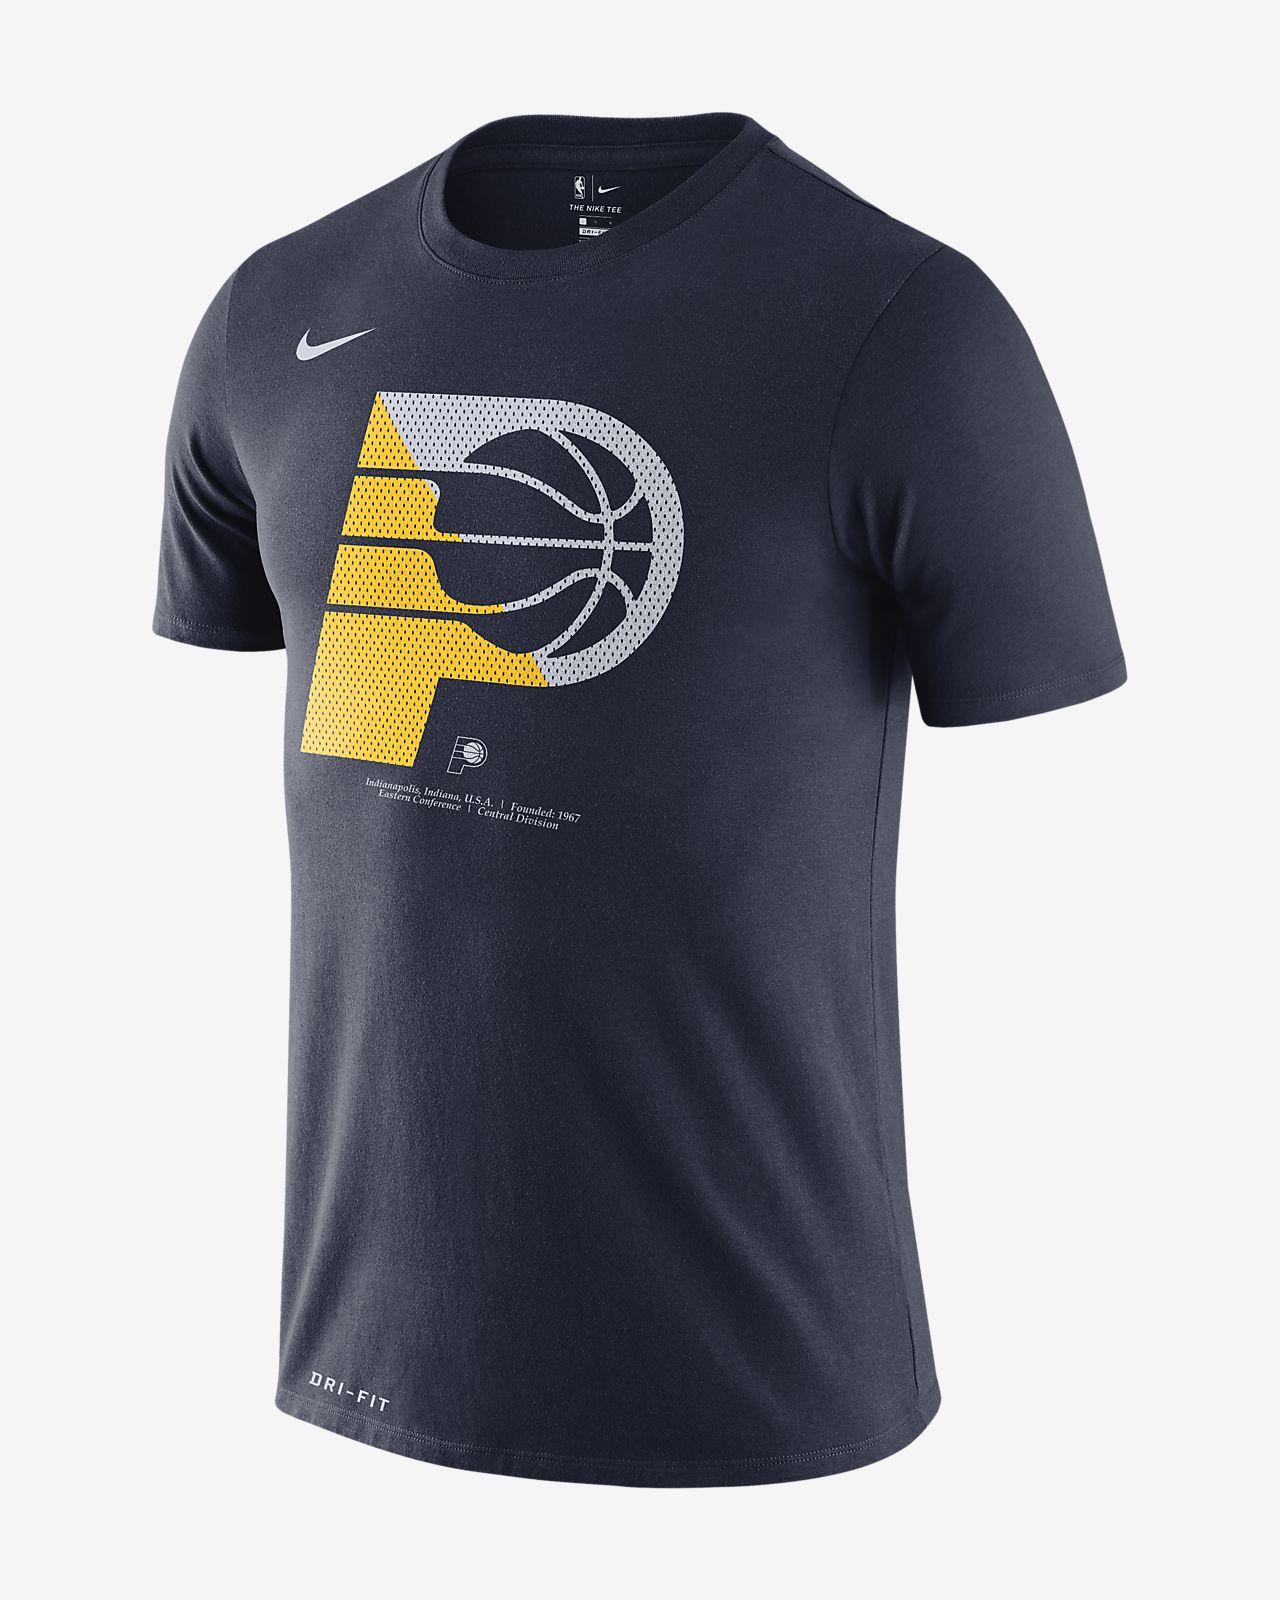 Indiana Pacers Nike Dri-FIT Men's NBA T-Shirt